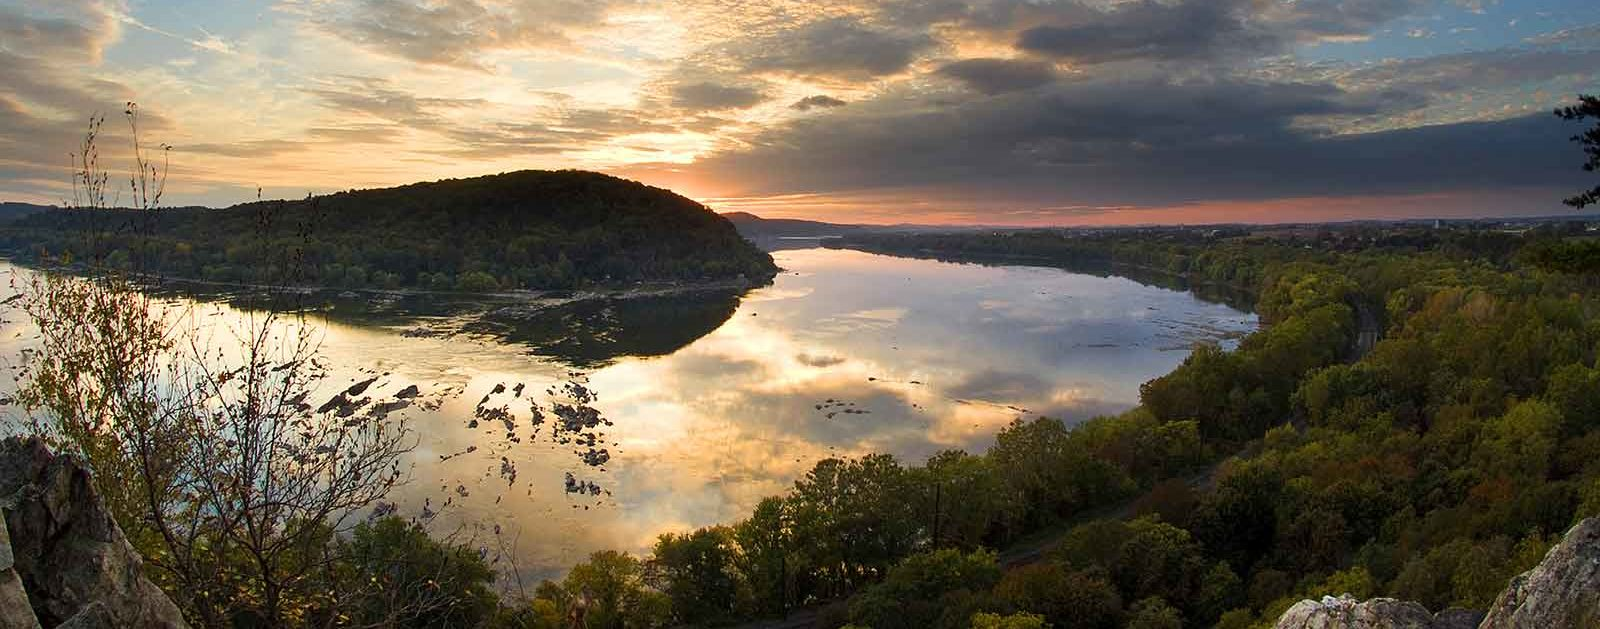 Susquehanna River, PA | Howie Hartman